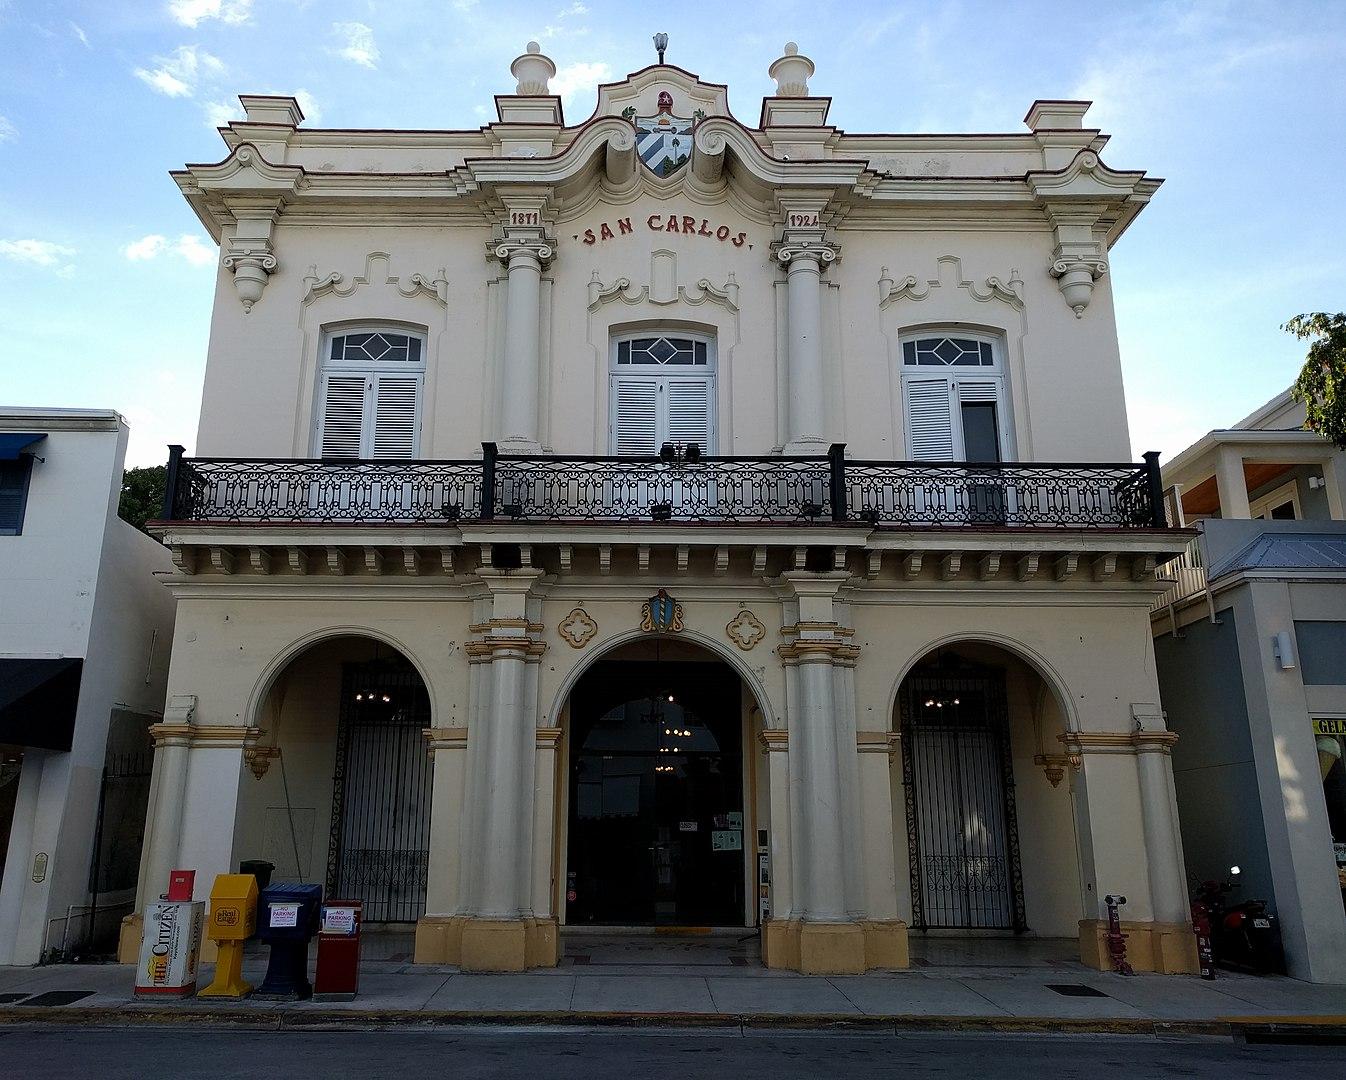 2015 photo of the San Carlos Institute